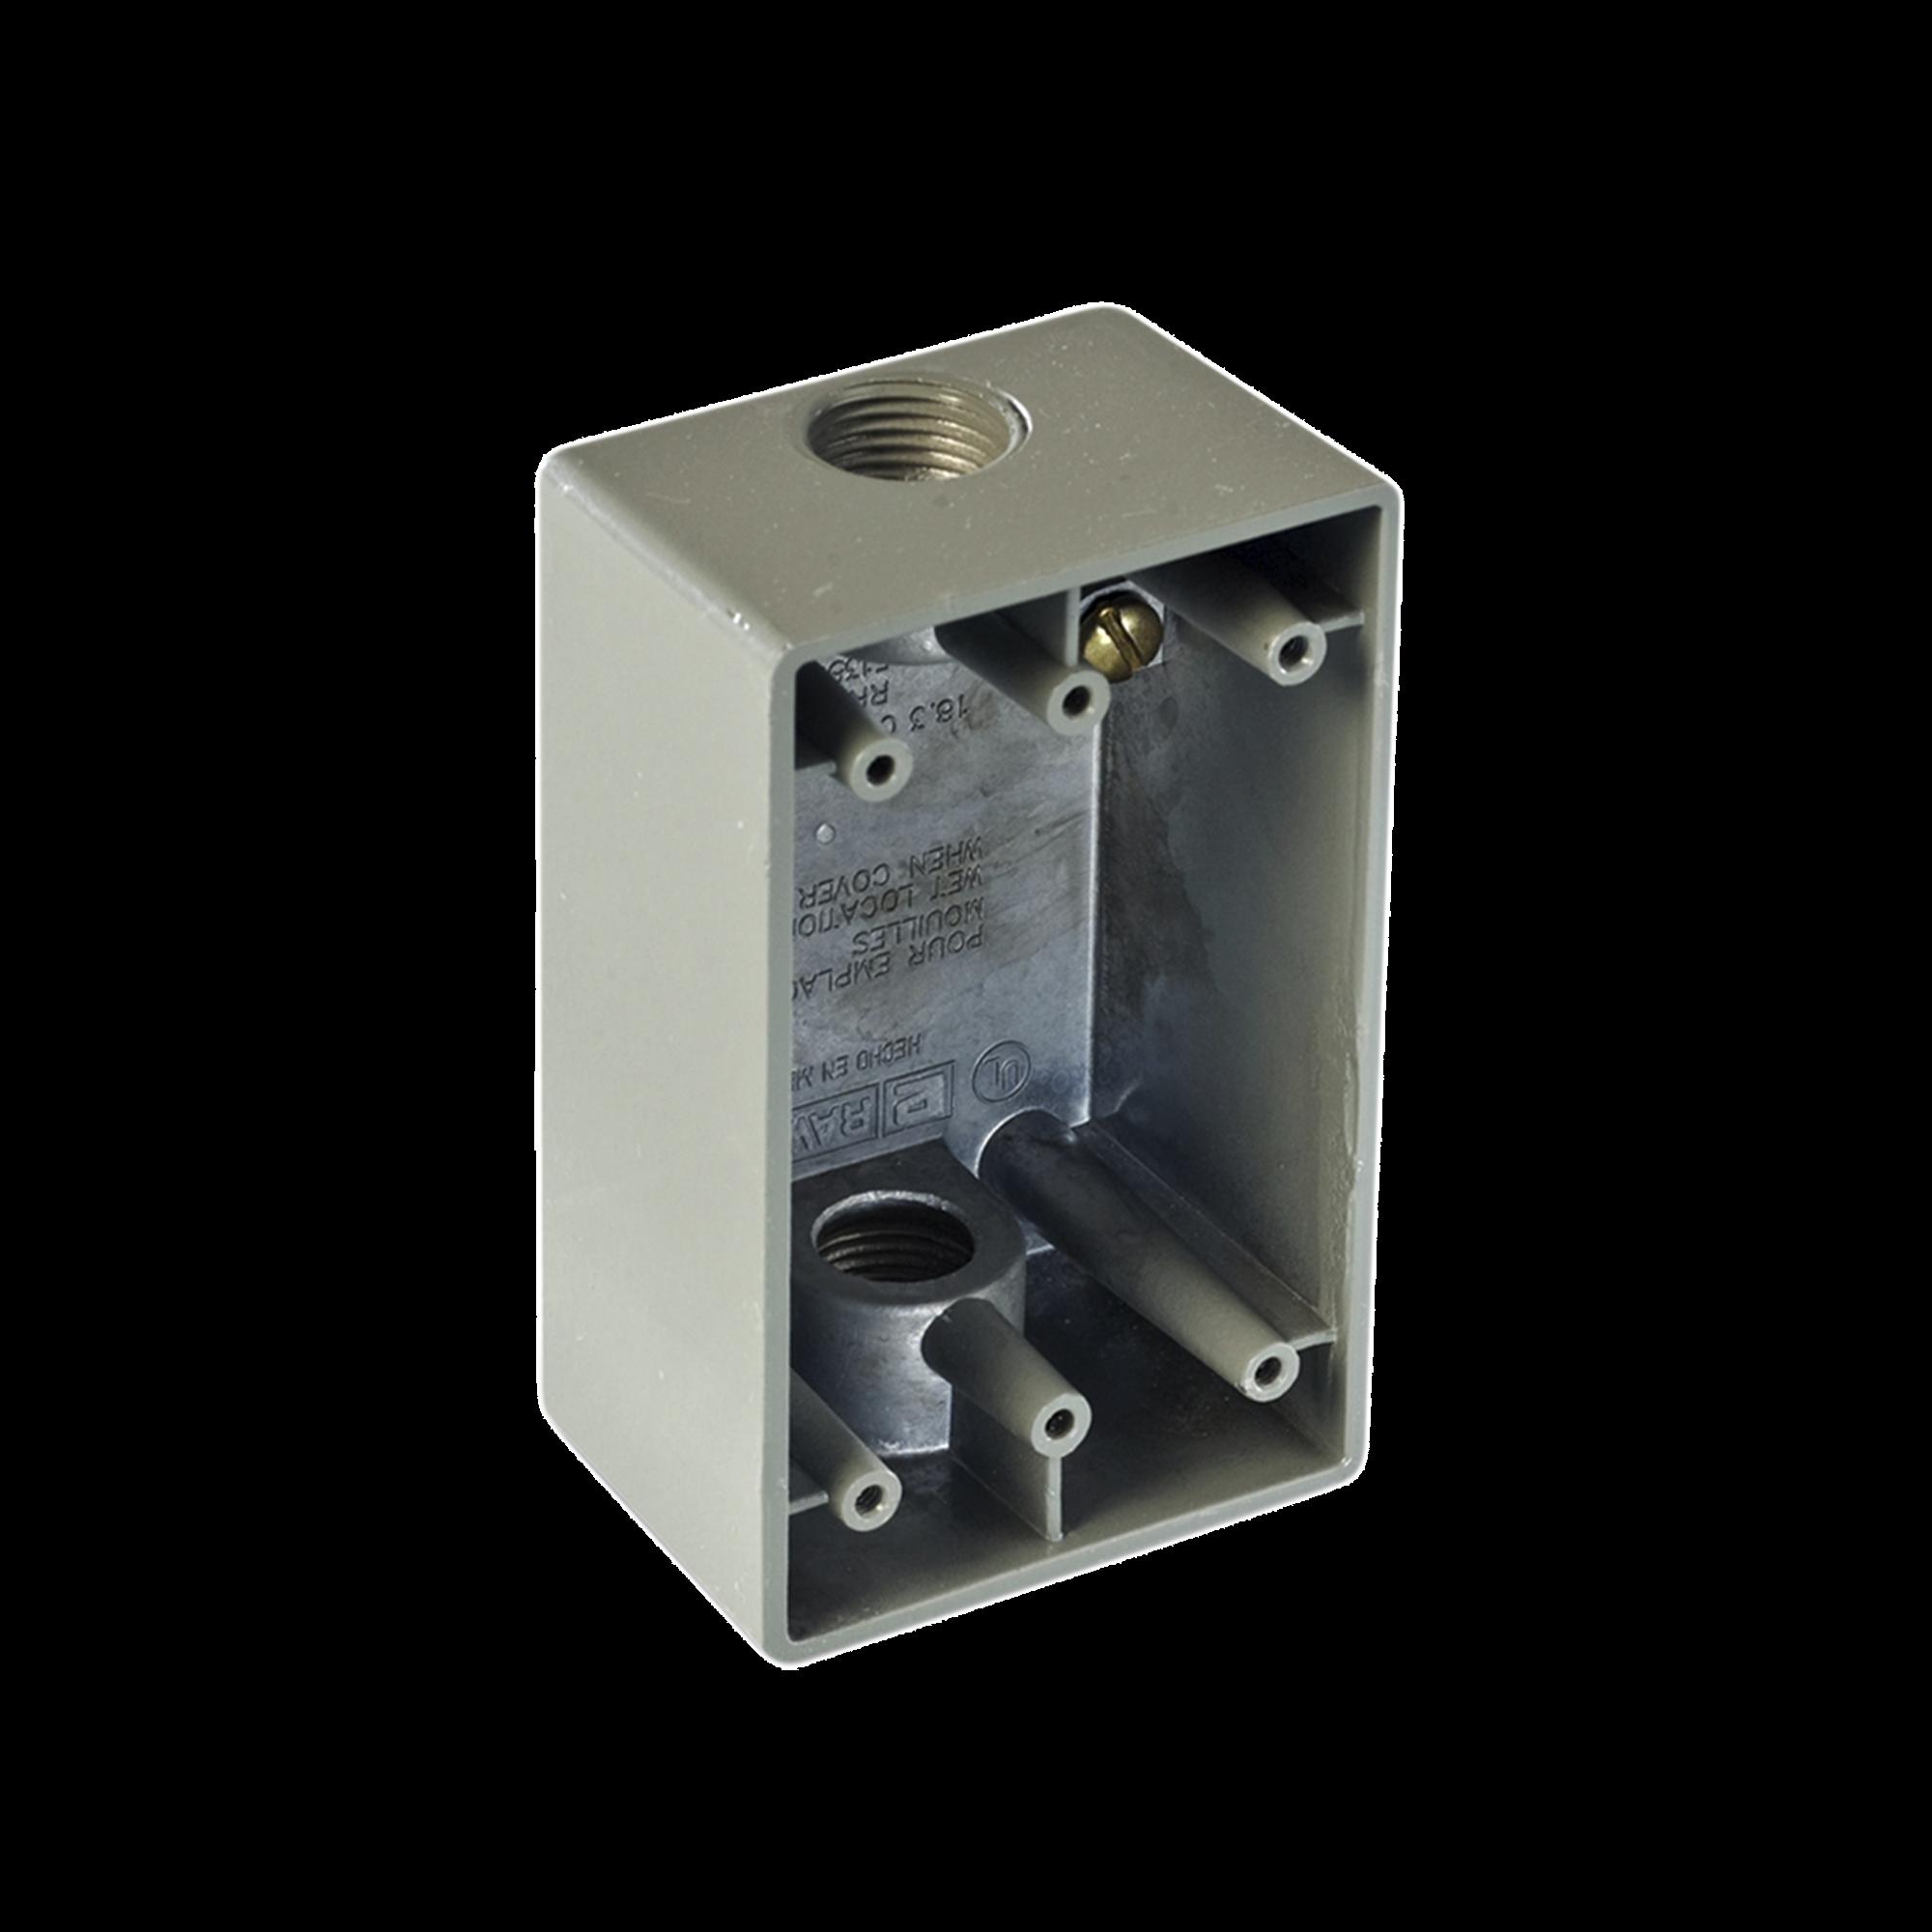 Caja Condulet FS de 1/2 ( 12.7 mm) con dos bocas a prueba de intemperie.